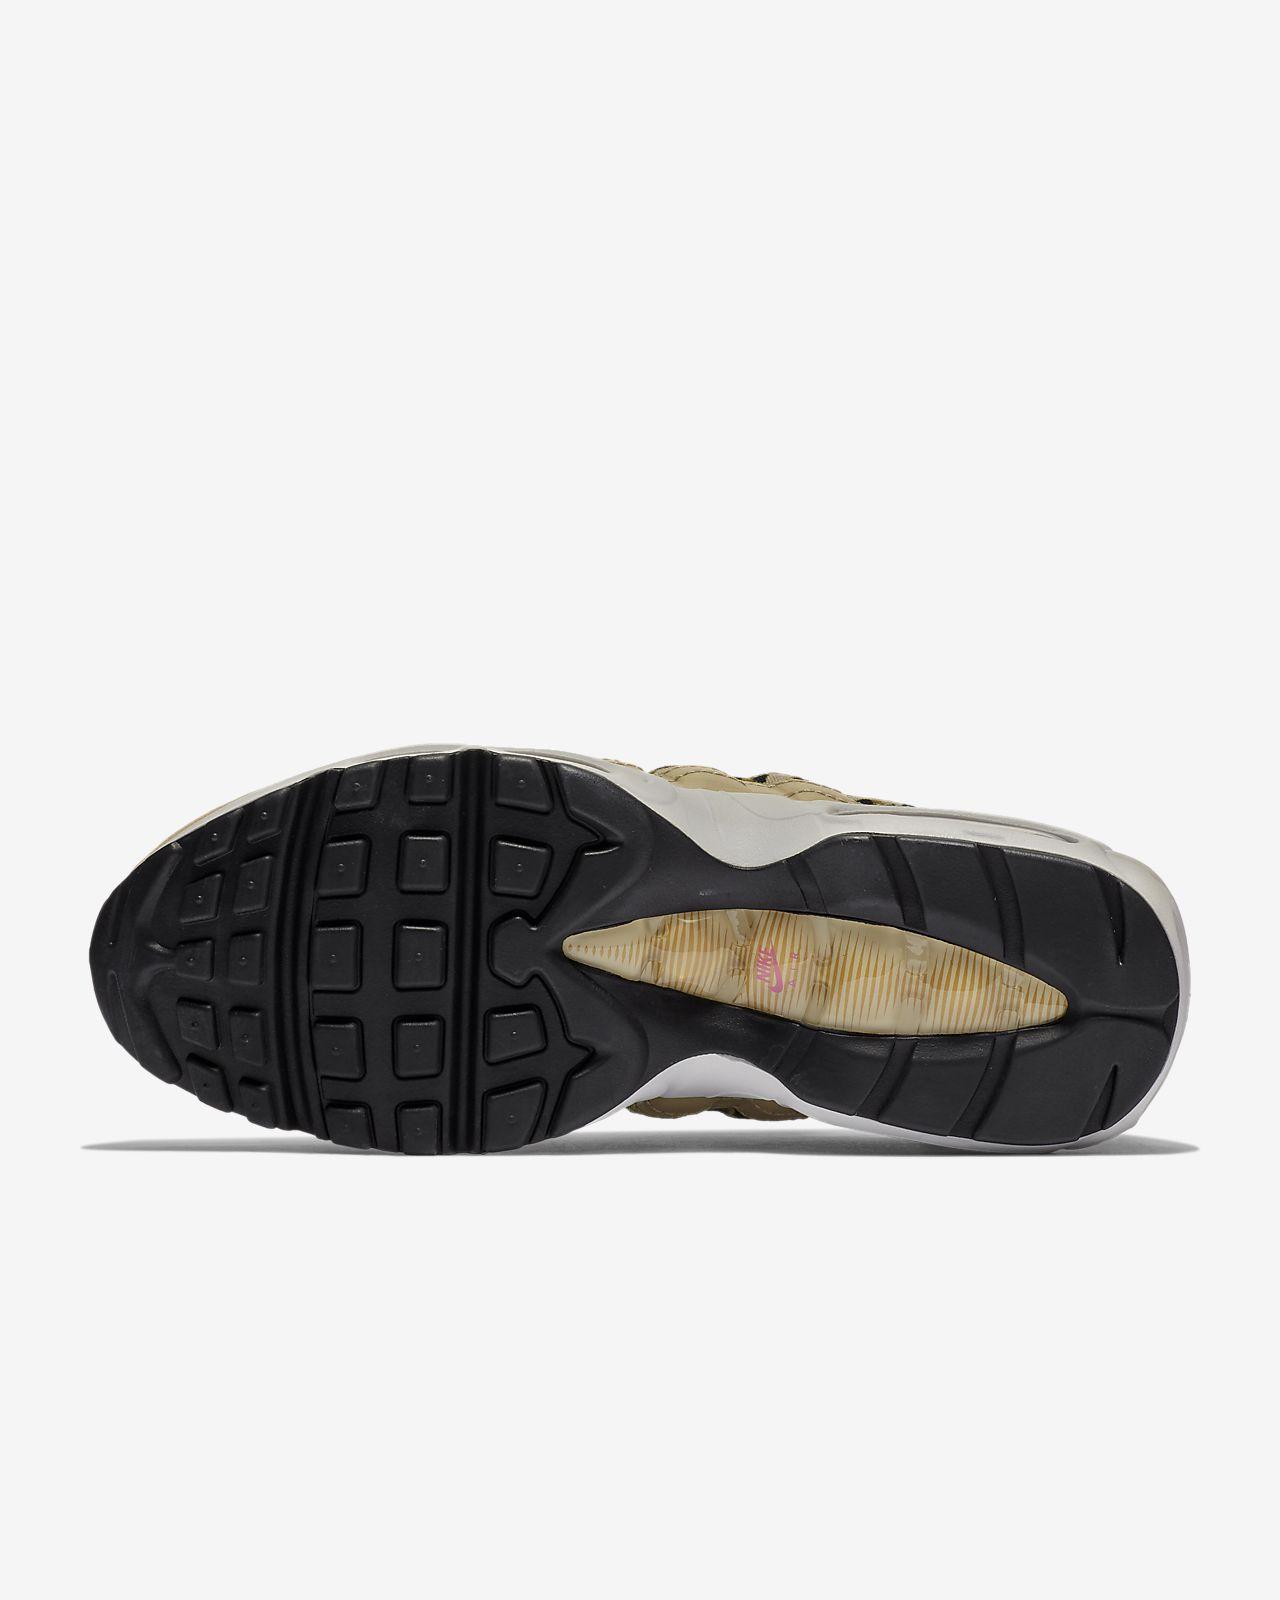 factory price ba5fa 75845 ... Nike Air Max 95 Premium Animal Womens Shoe